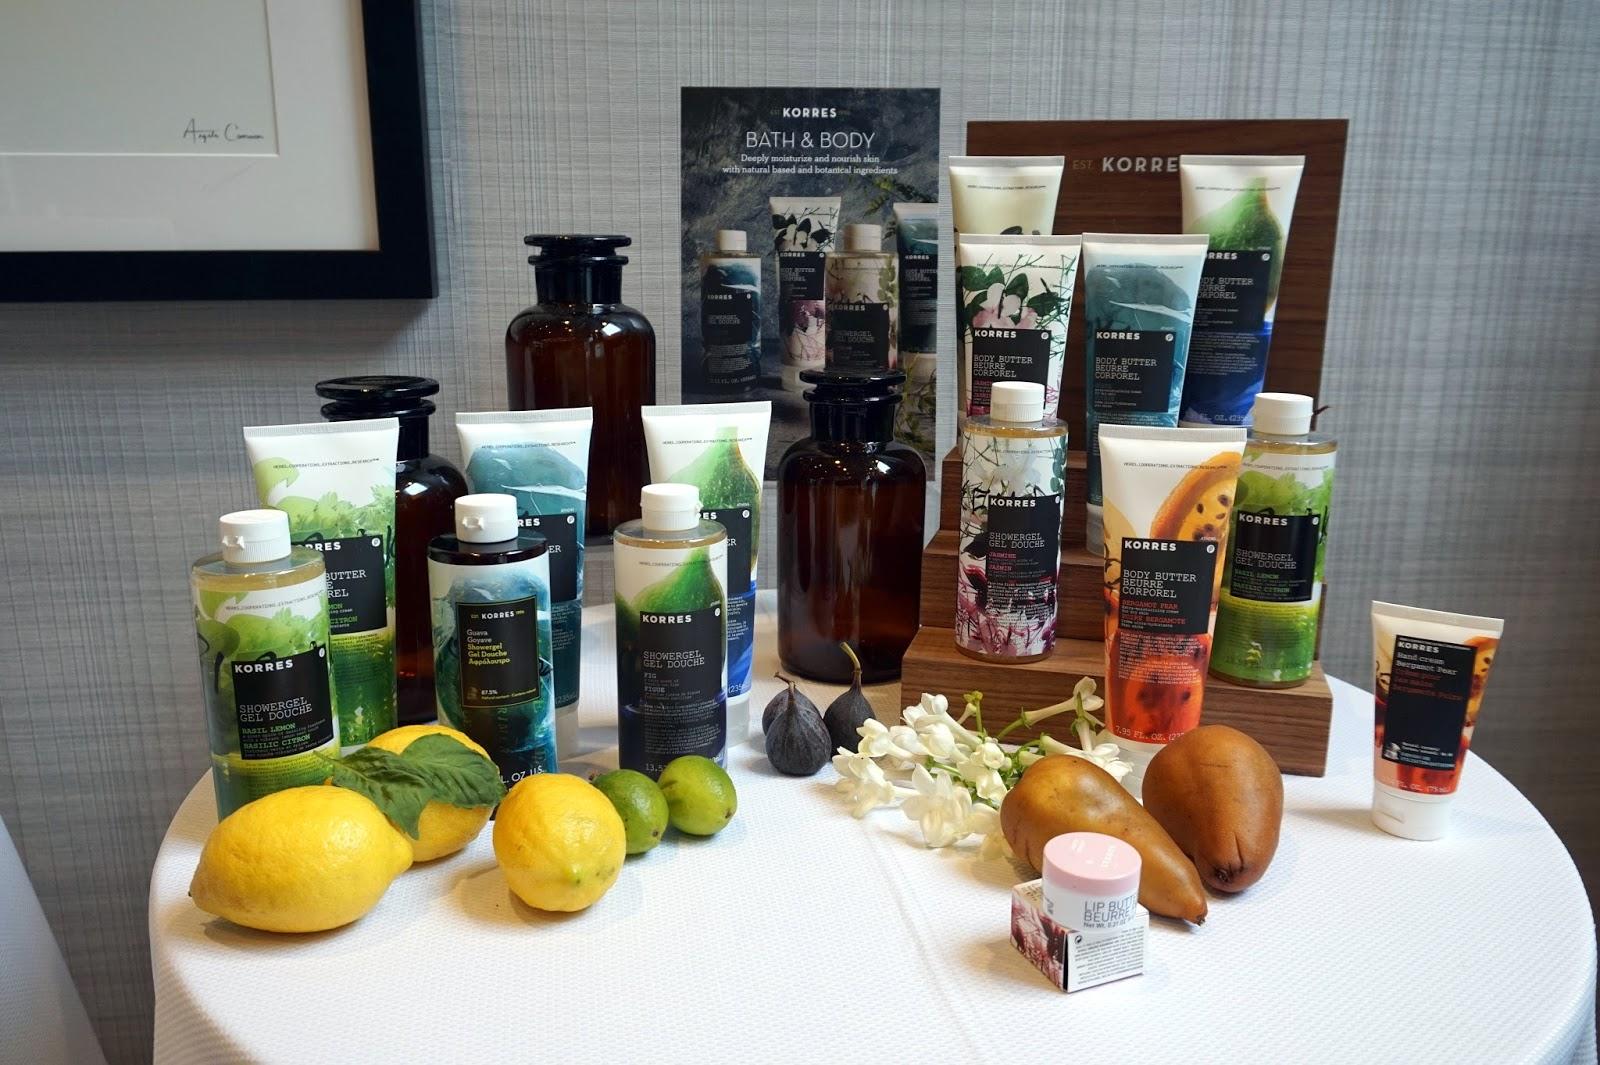 korres bath and body